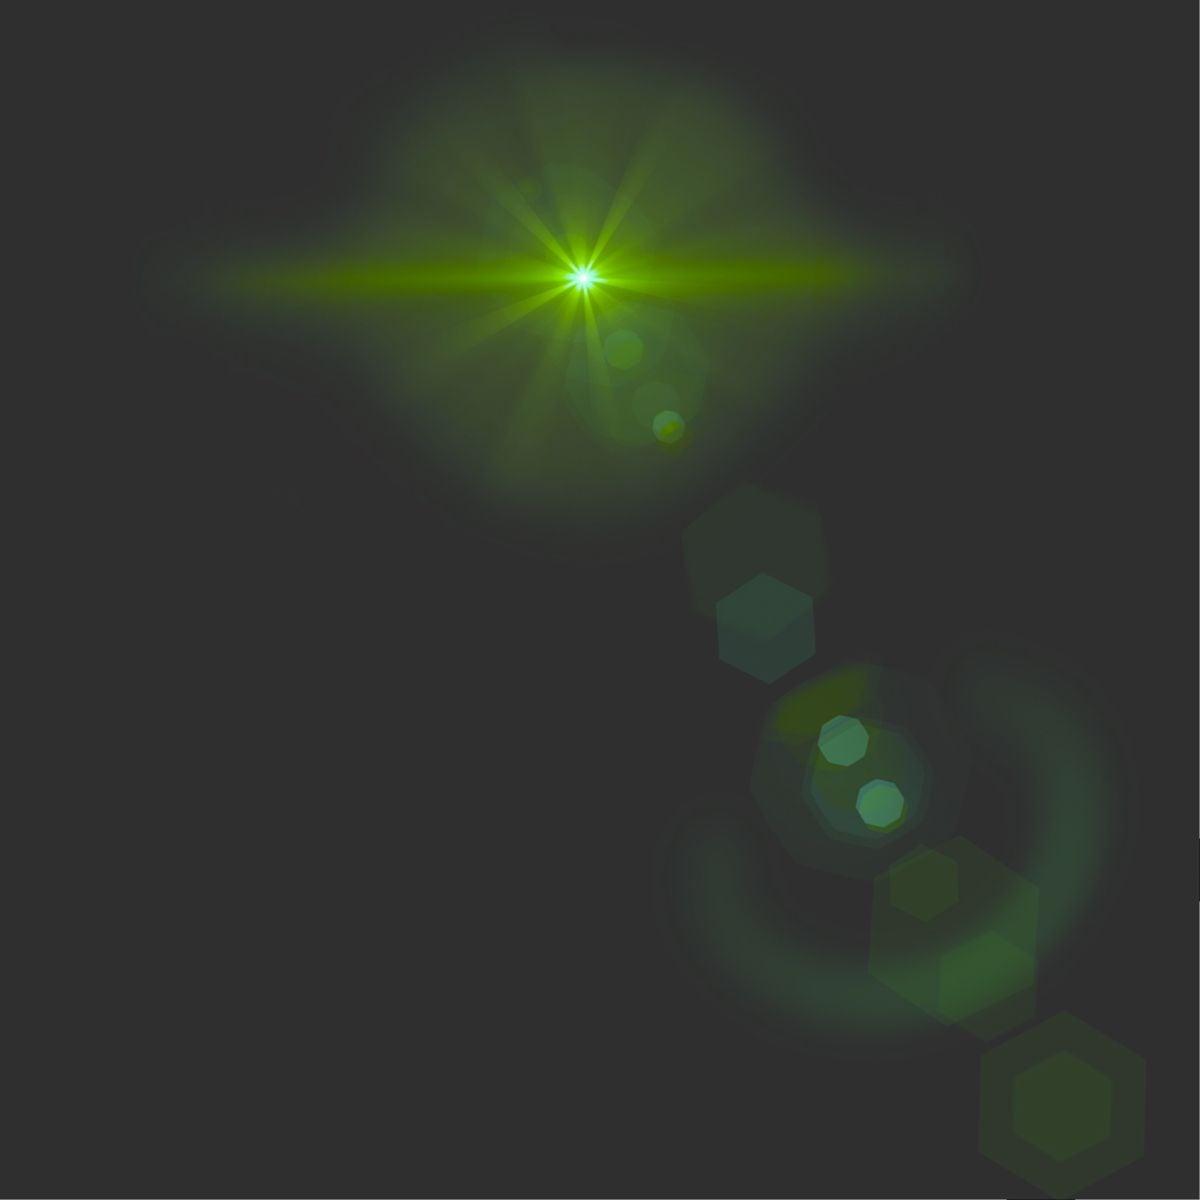 A dark sky, with a green, circular light at the top.